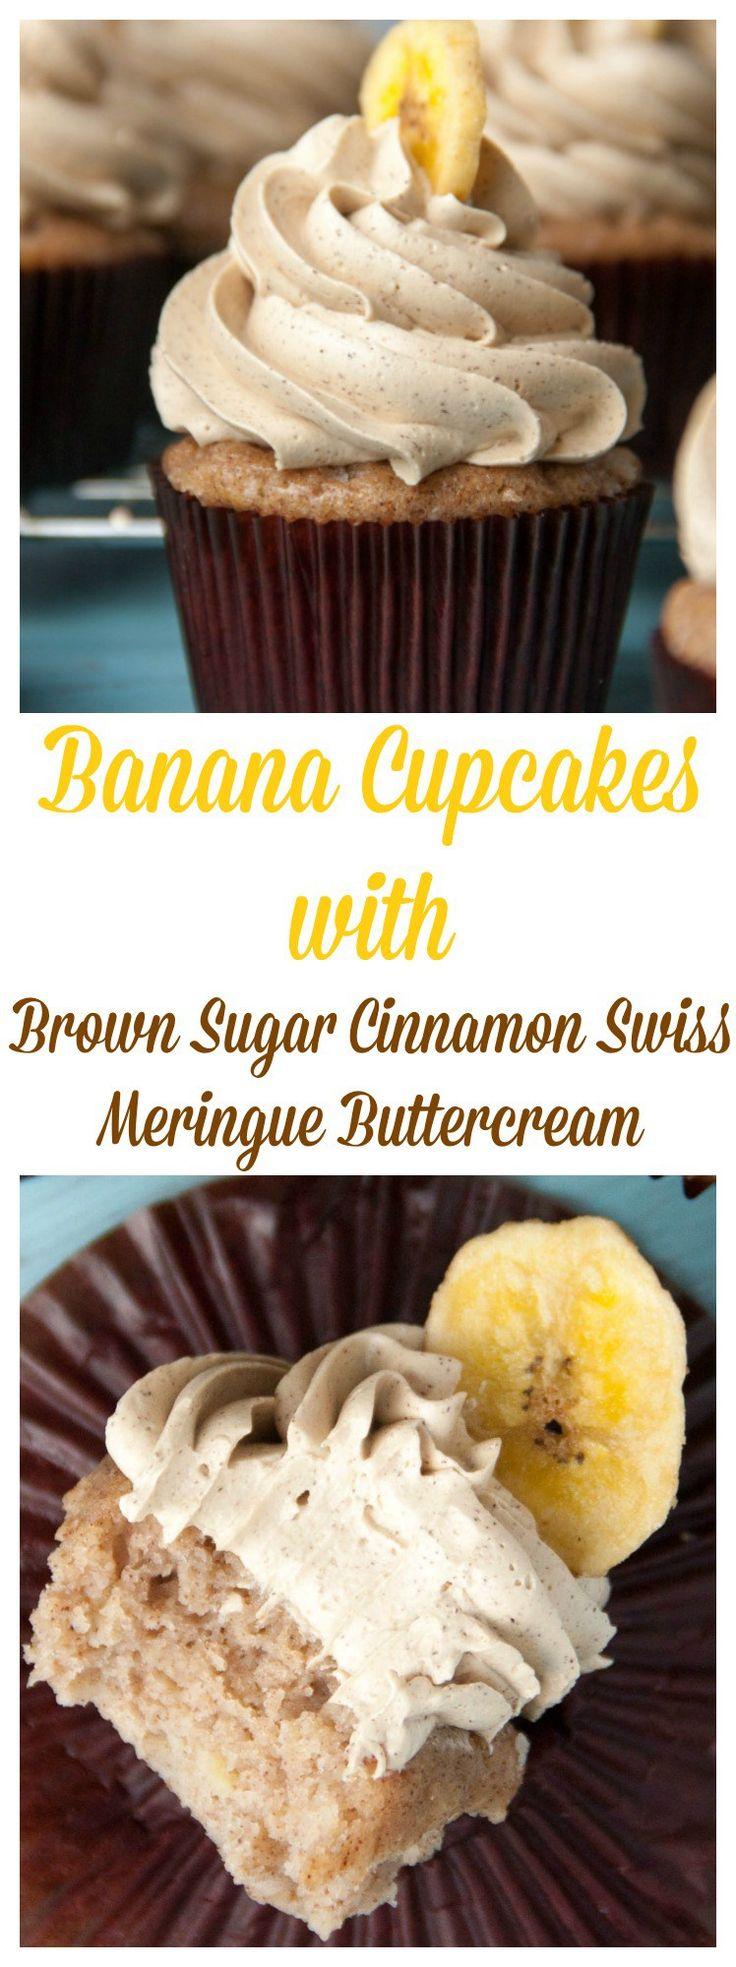 Banana Cupcakes With Brown Sugar Cinnamon Swiss Meringue Buttercream Boston Girl Bakes